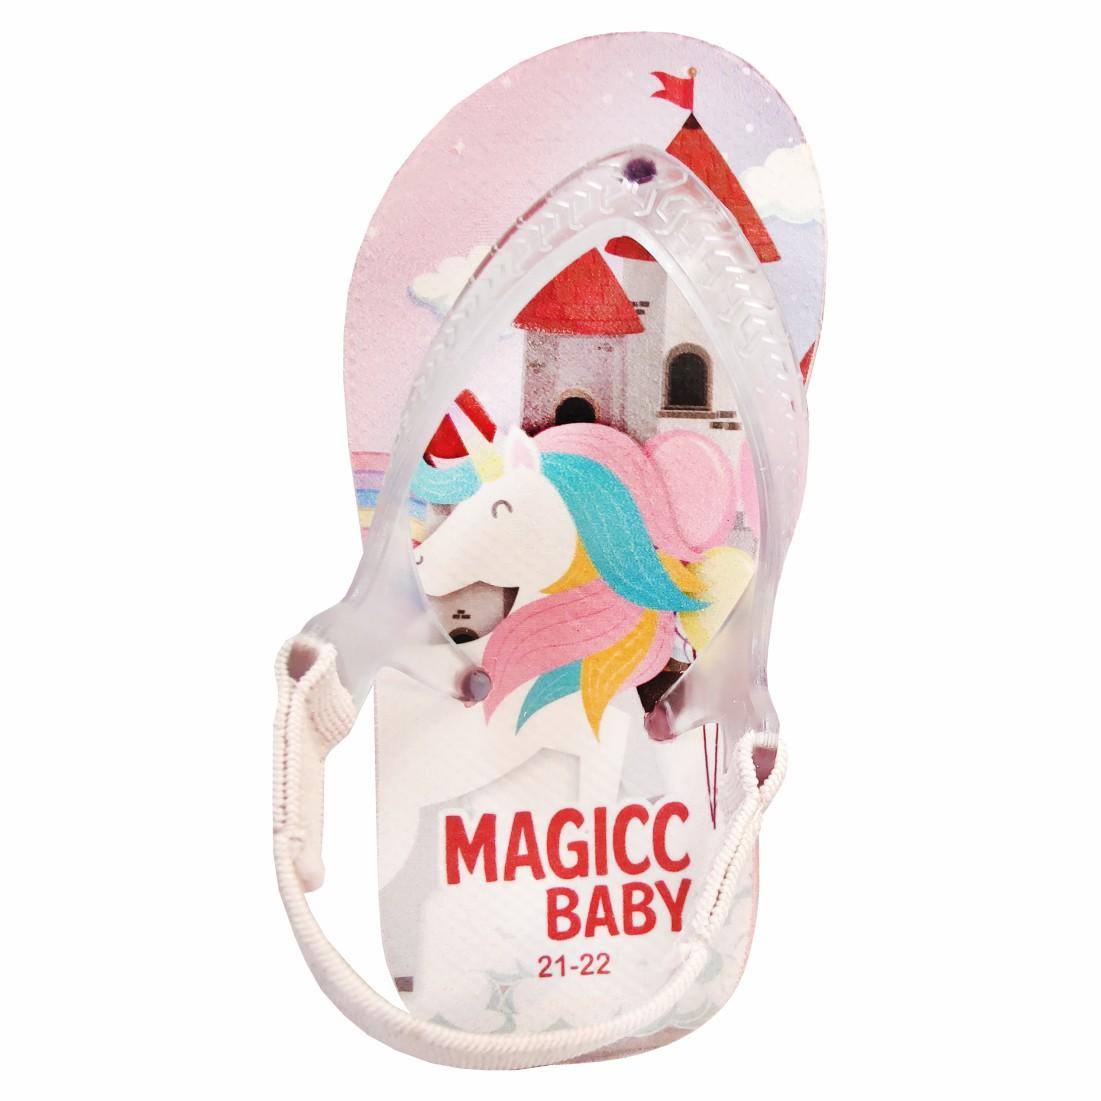 Chinelo Bebê Sandália Infantil Unicórnio Meninas Magicc Baby